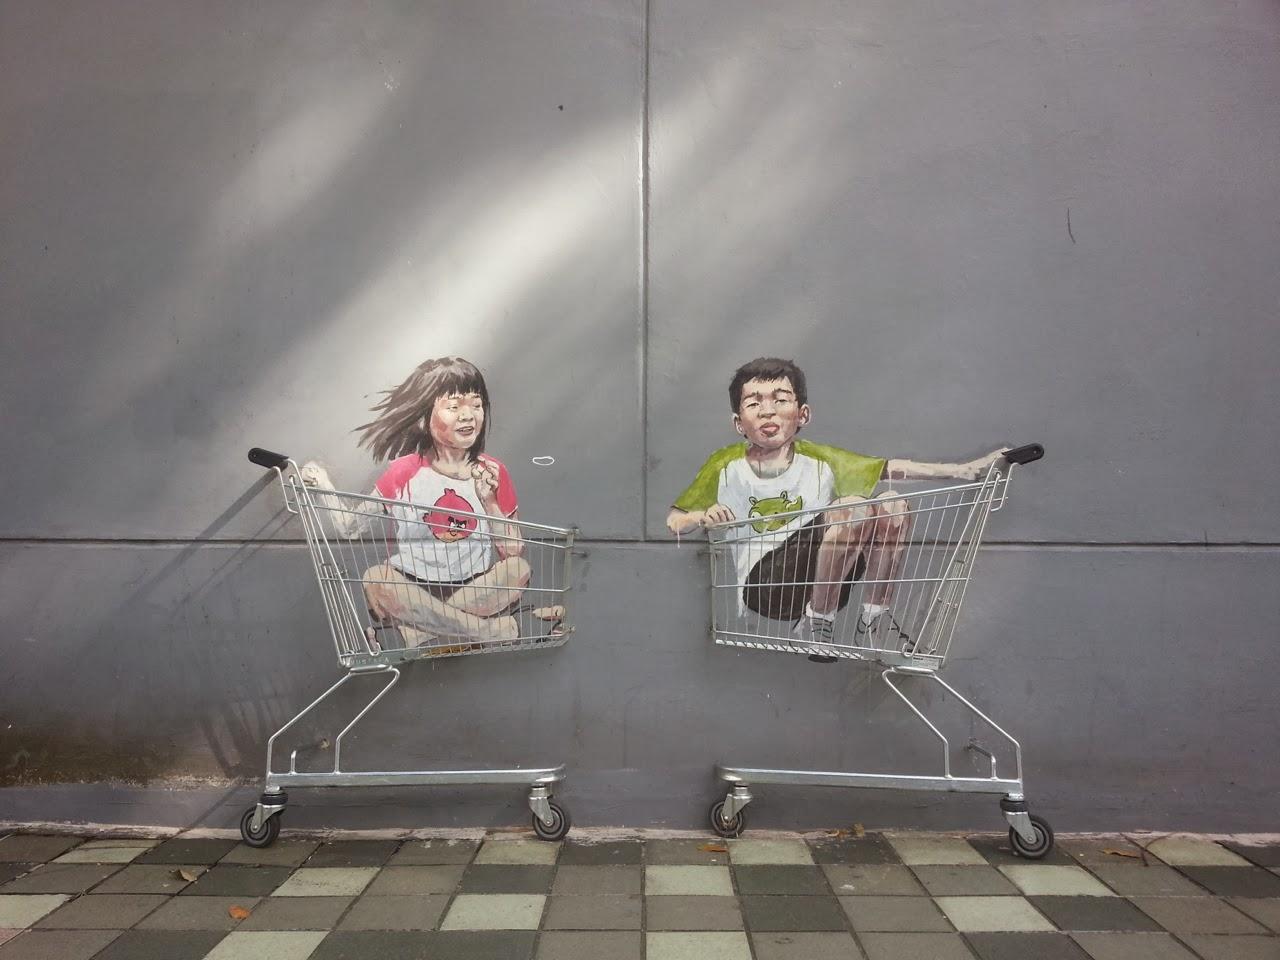 ernest-zacharevic-new-pieces-singapore-city-05